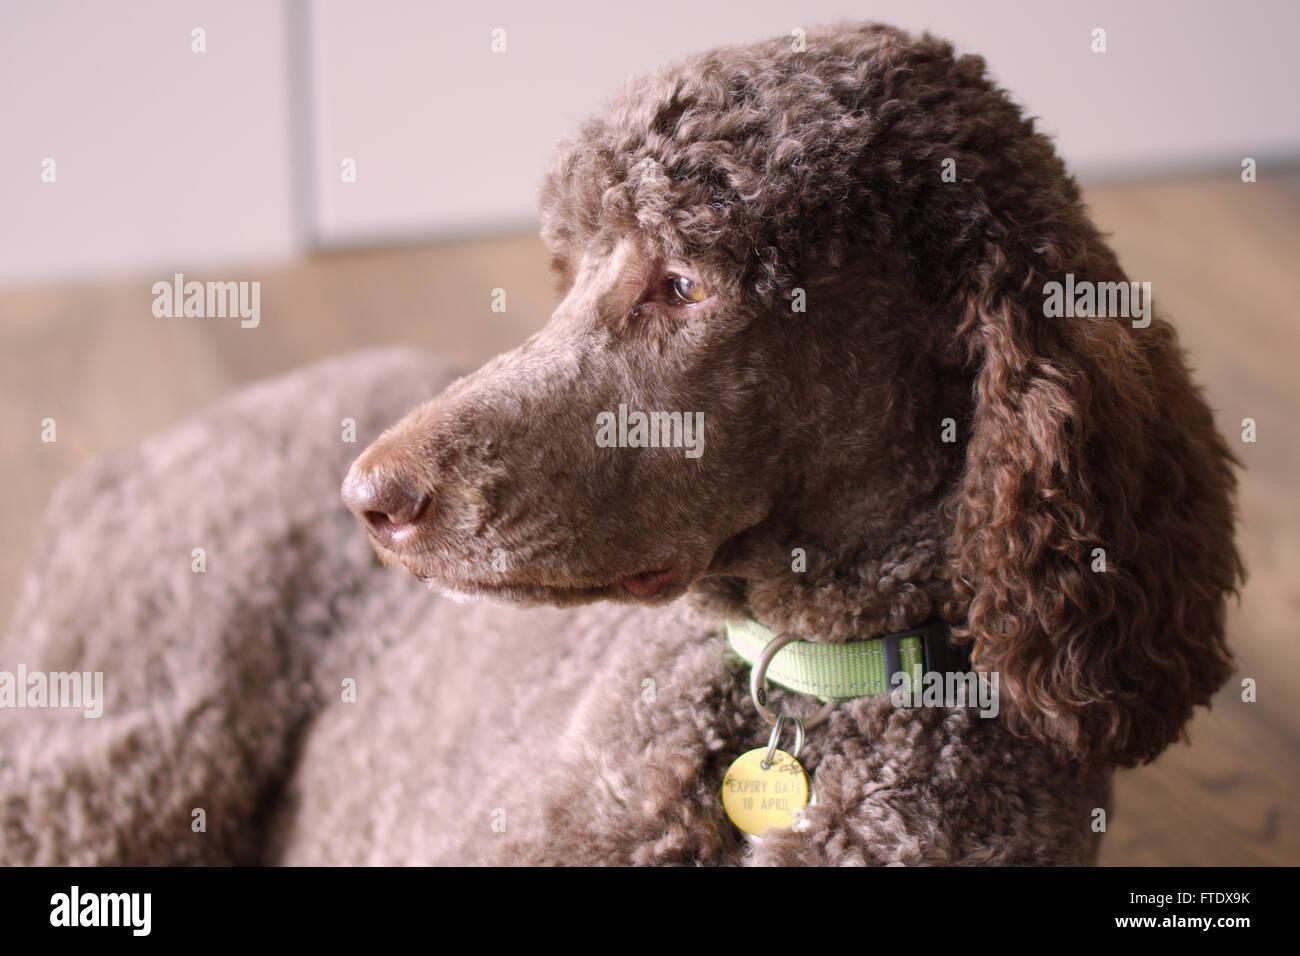 Standard Poodle - Stock Image